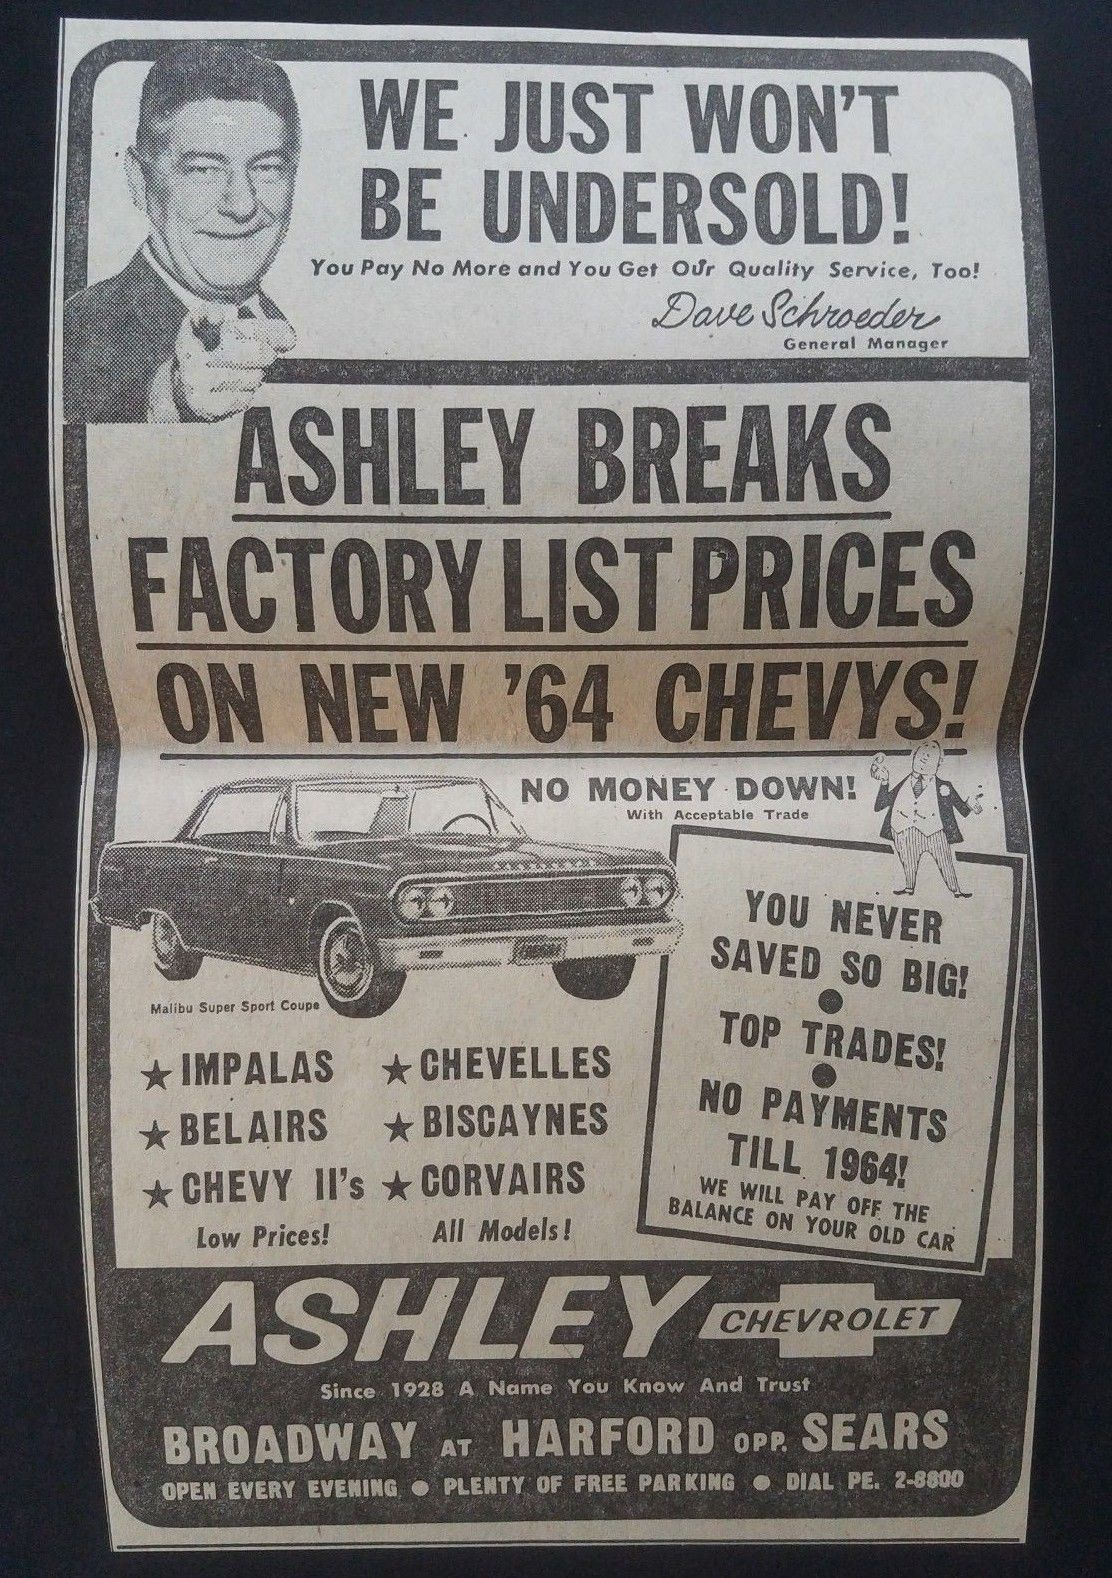 1964 Ashley Chevrolet Dealership Baltimore Maryland Chevrolet Dealership Dealership Car Dealership